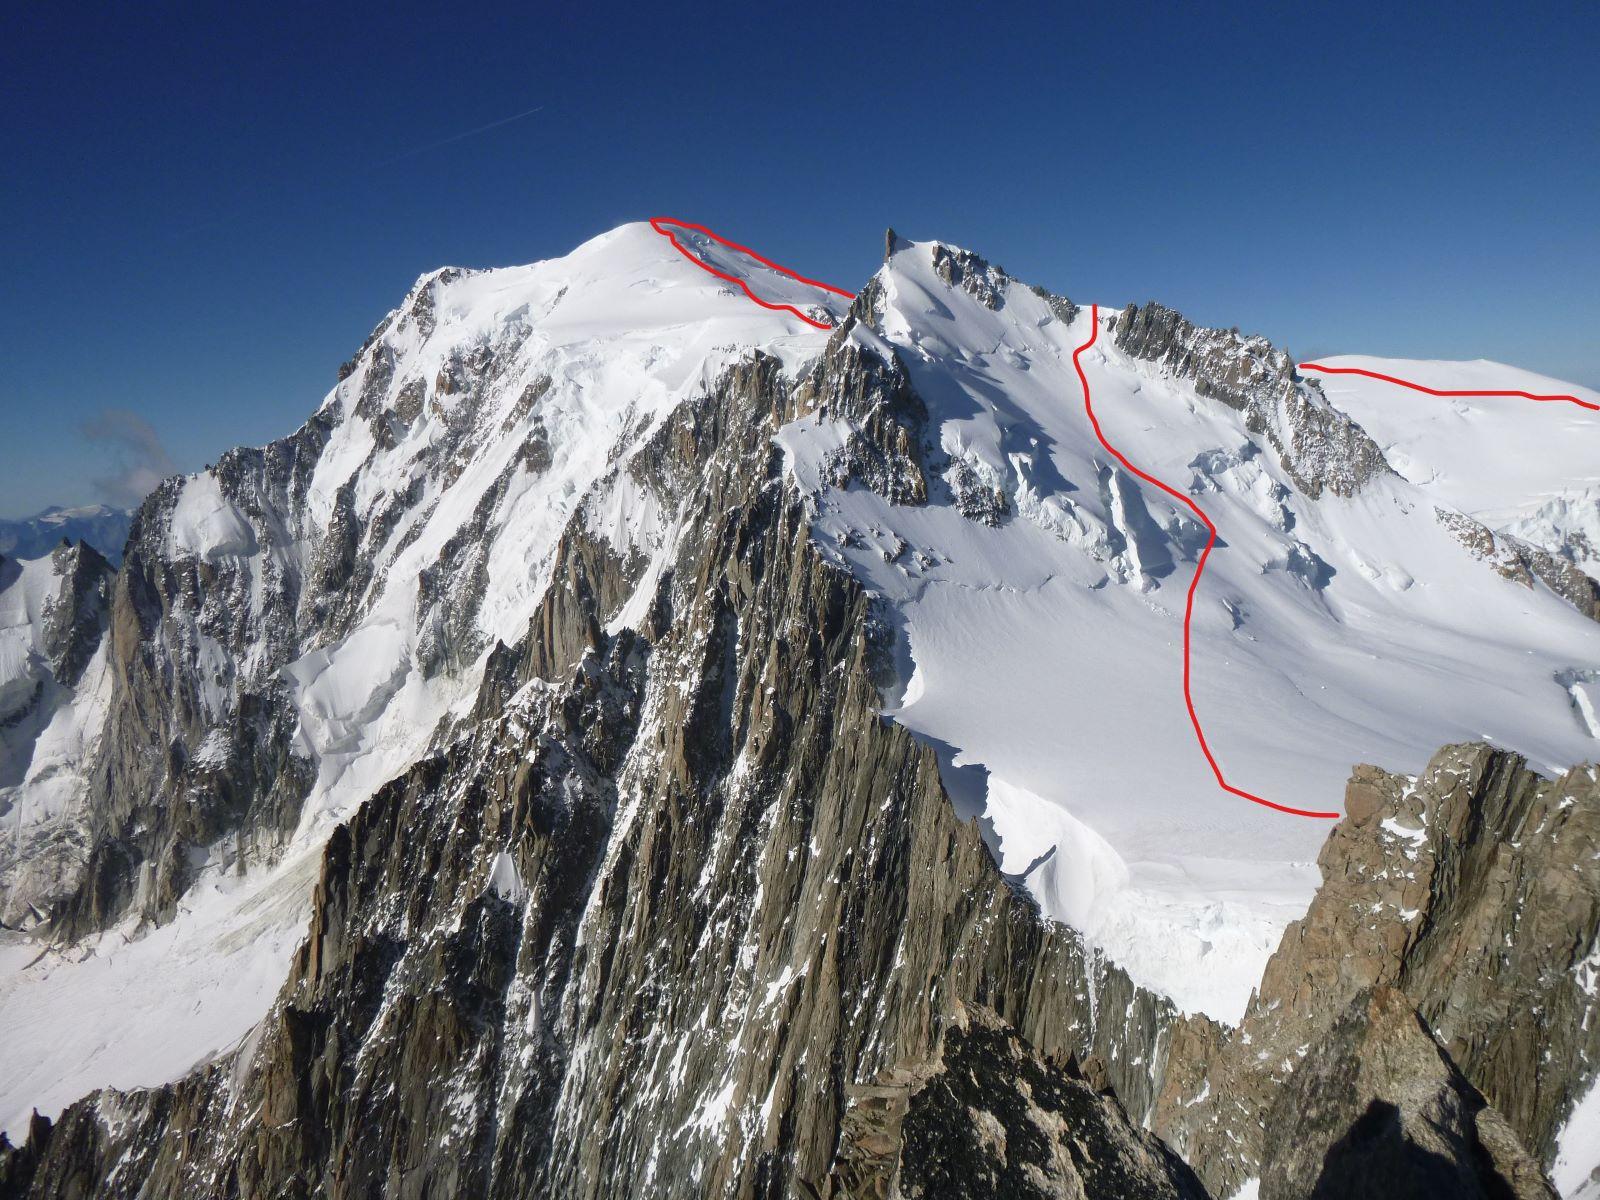 monte Bianco m 4.810 dal rifugio Cosmiques